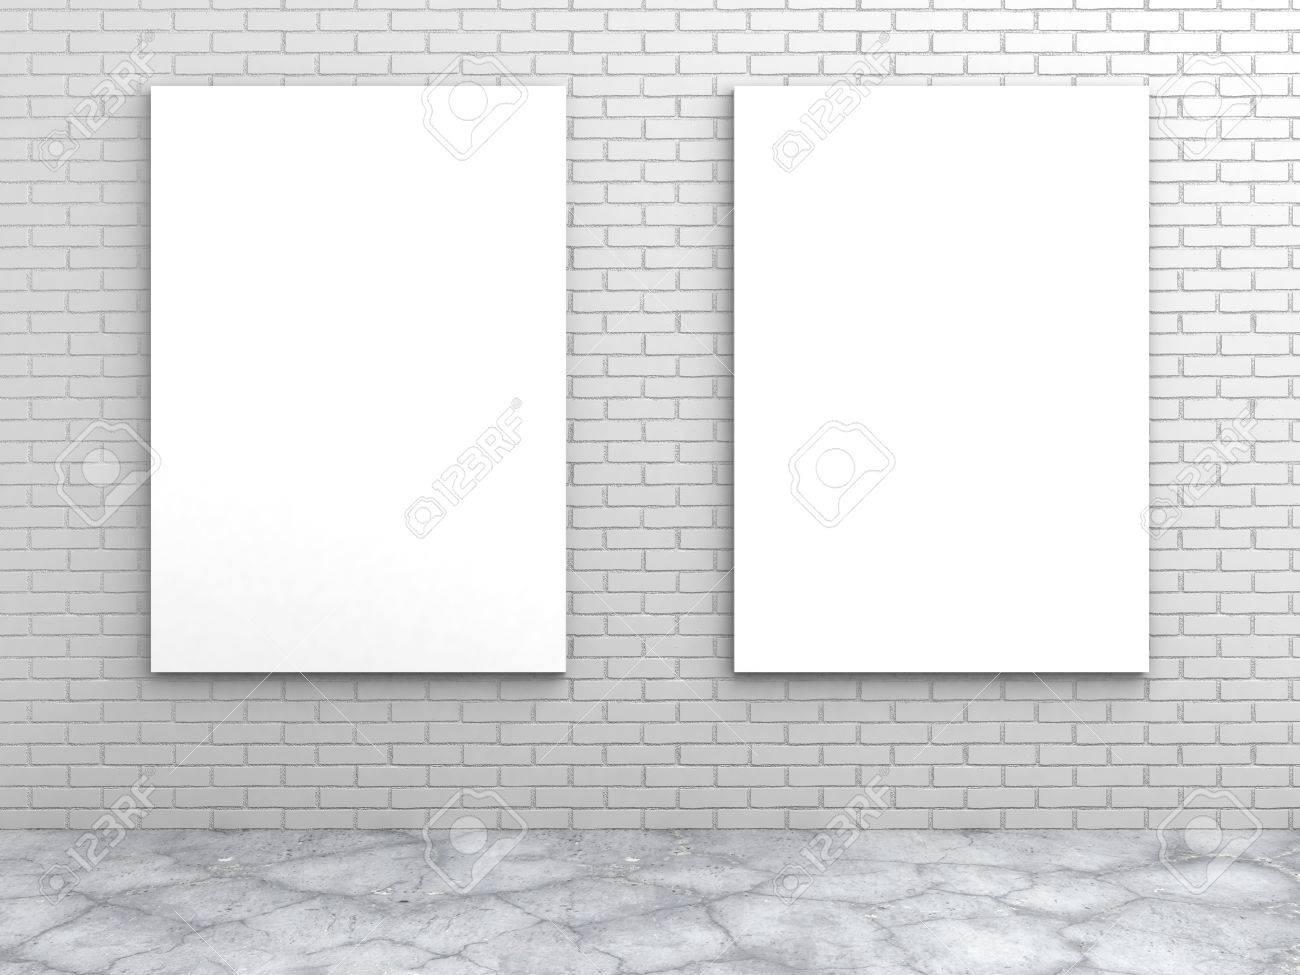 3f39290976d two white blank frames on a brick wall. 3d render illustration Stock  Illustration - 64399766